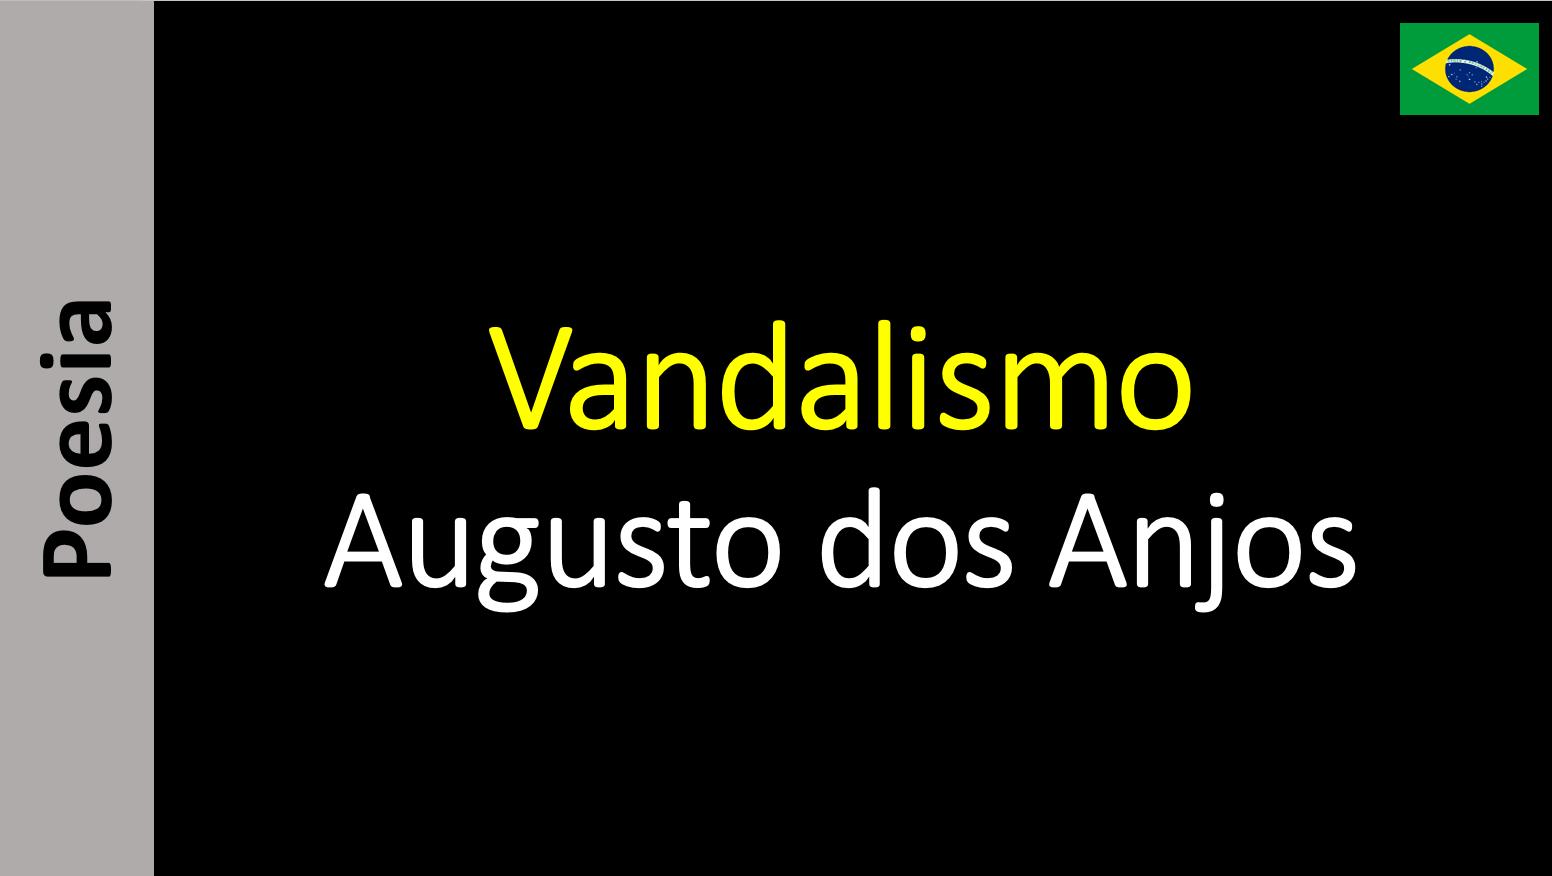 Augusto dos Anjos - Vandalismo